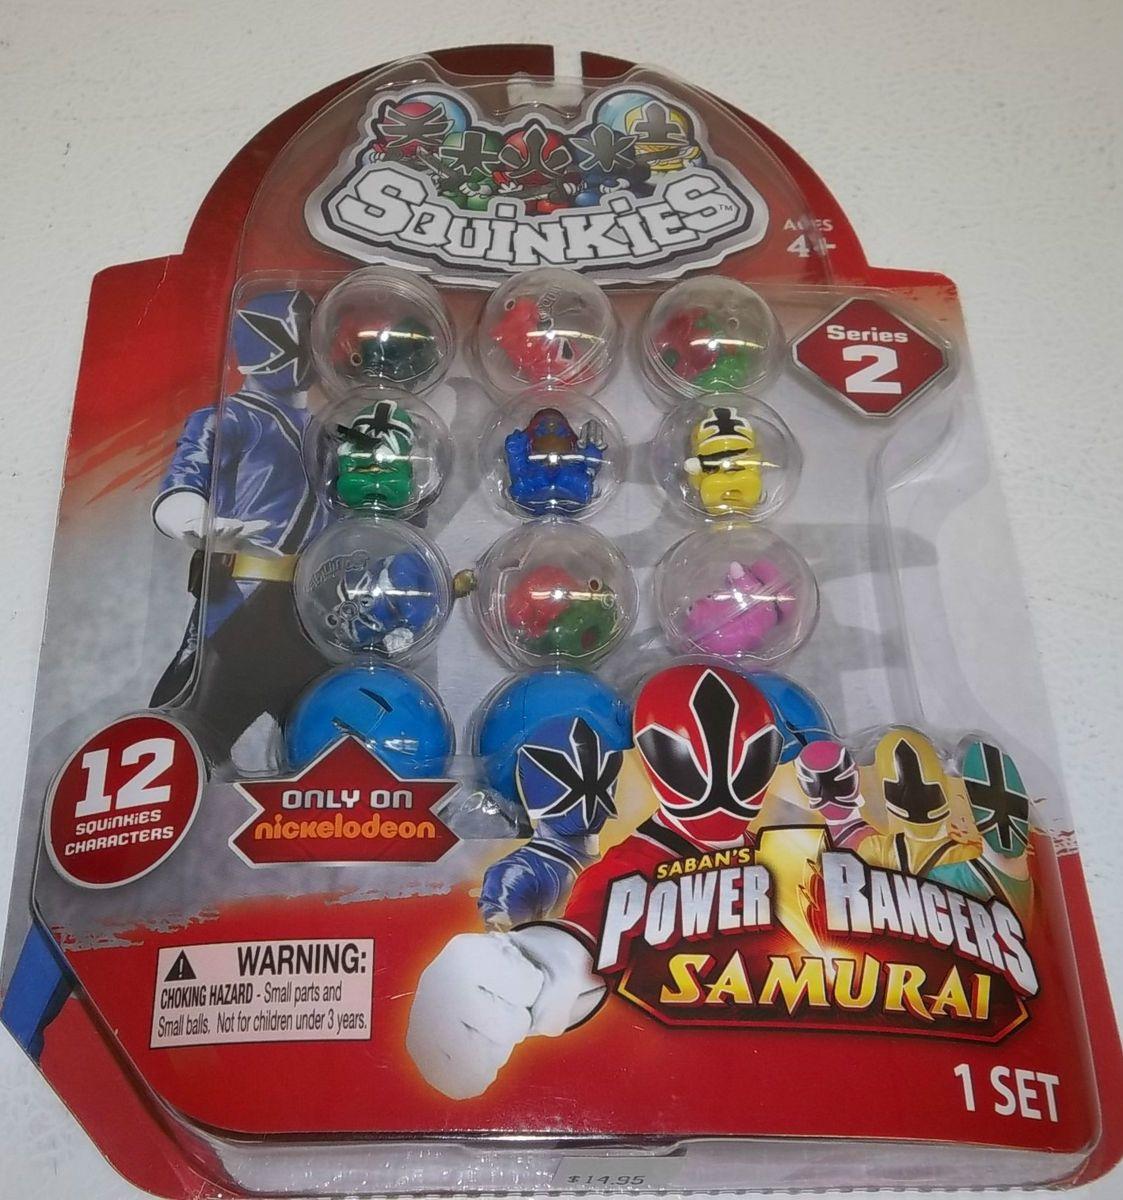 2012 Blip Toys Squinkies Power Rangers Samurai Series 2 Set of 12